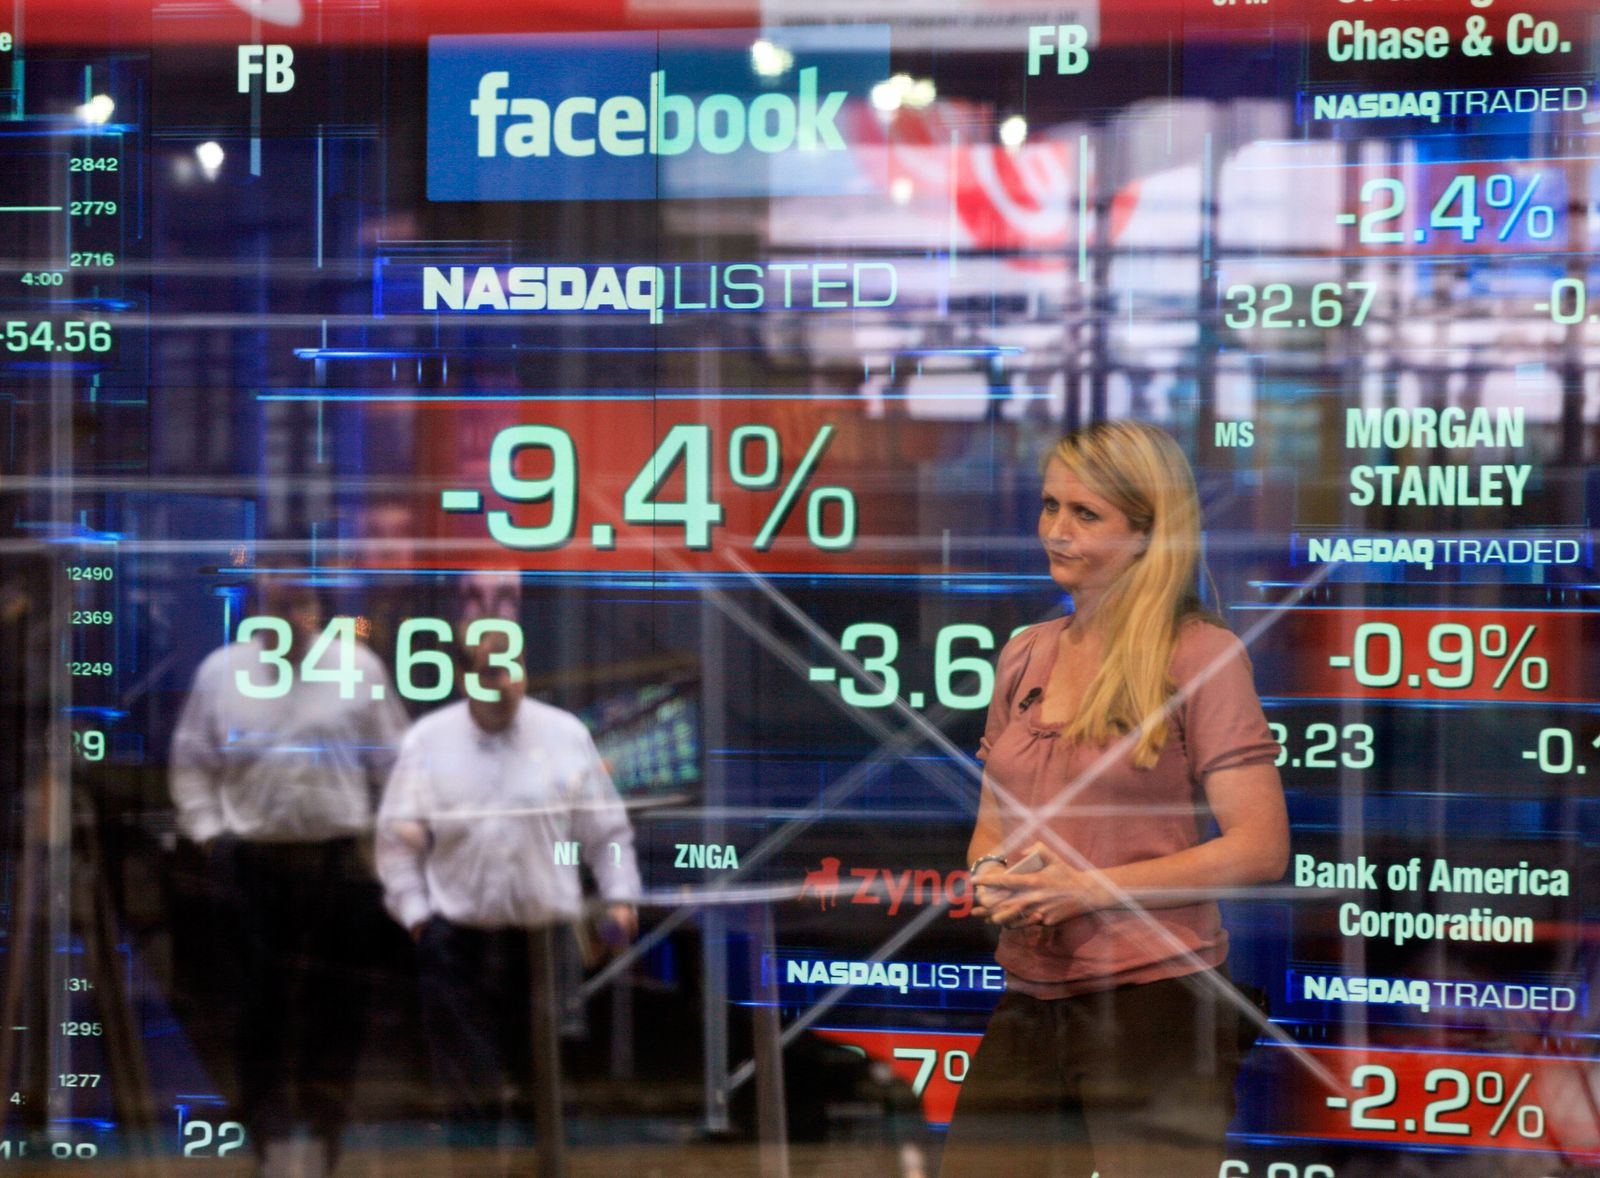 Facebook Börsengang / Börsensturz